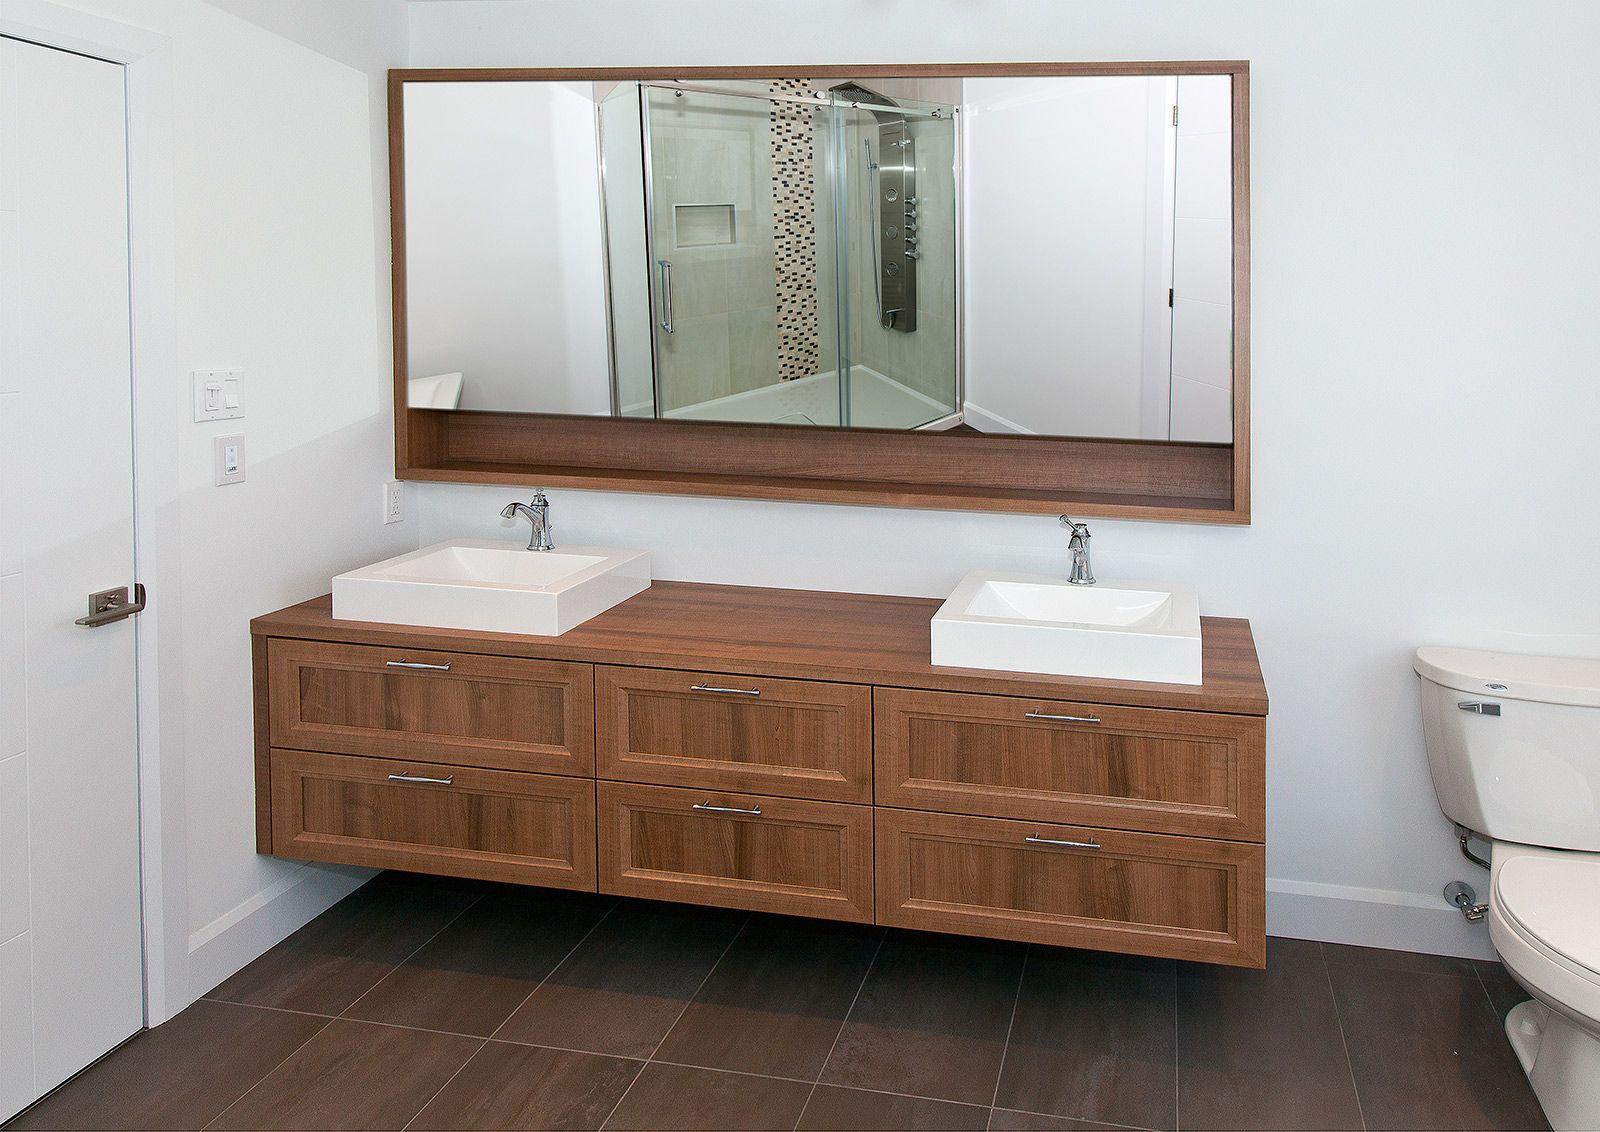 Salle de bains contemporaine griffe cuisine for Salle de bain x2o tournai